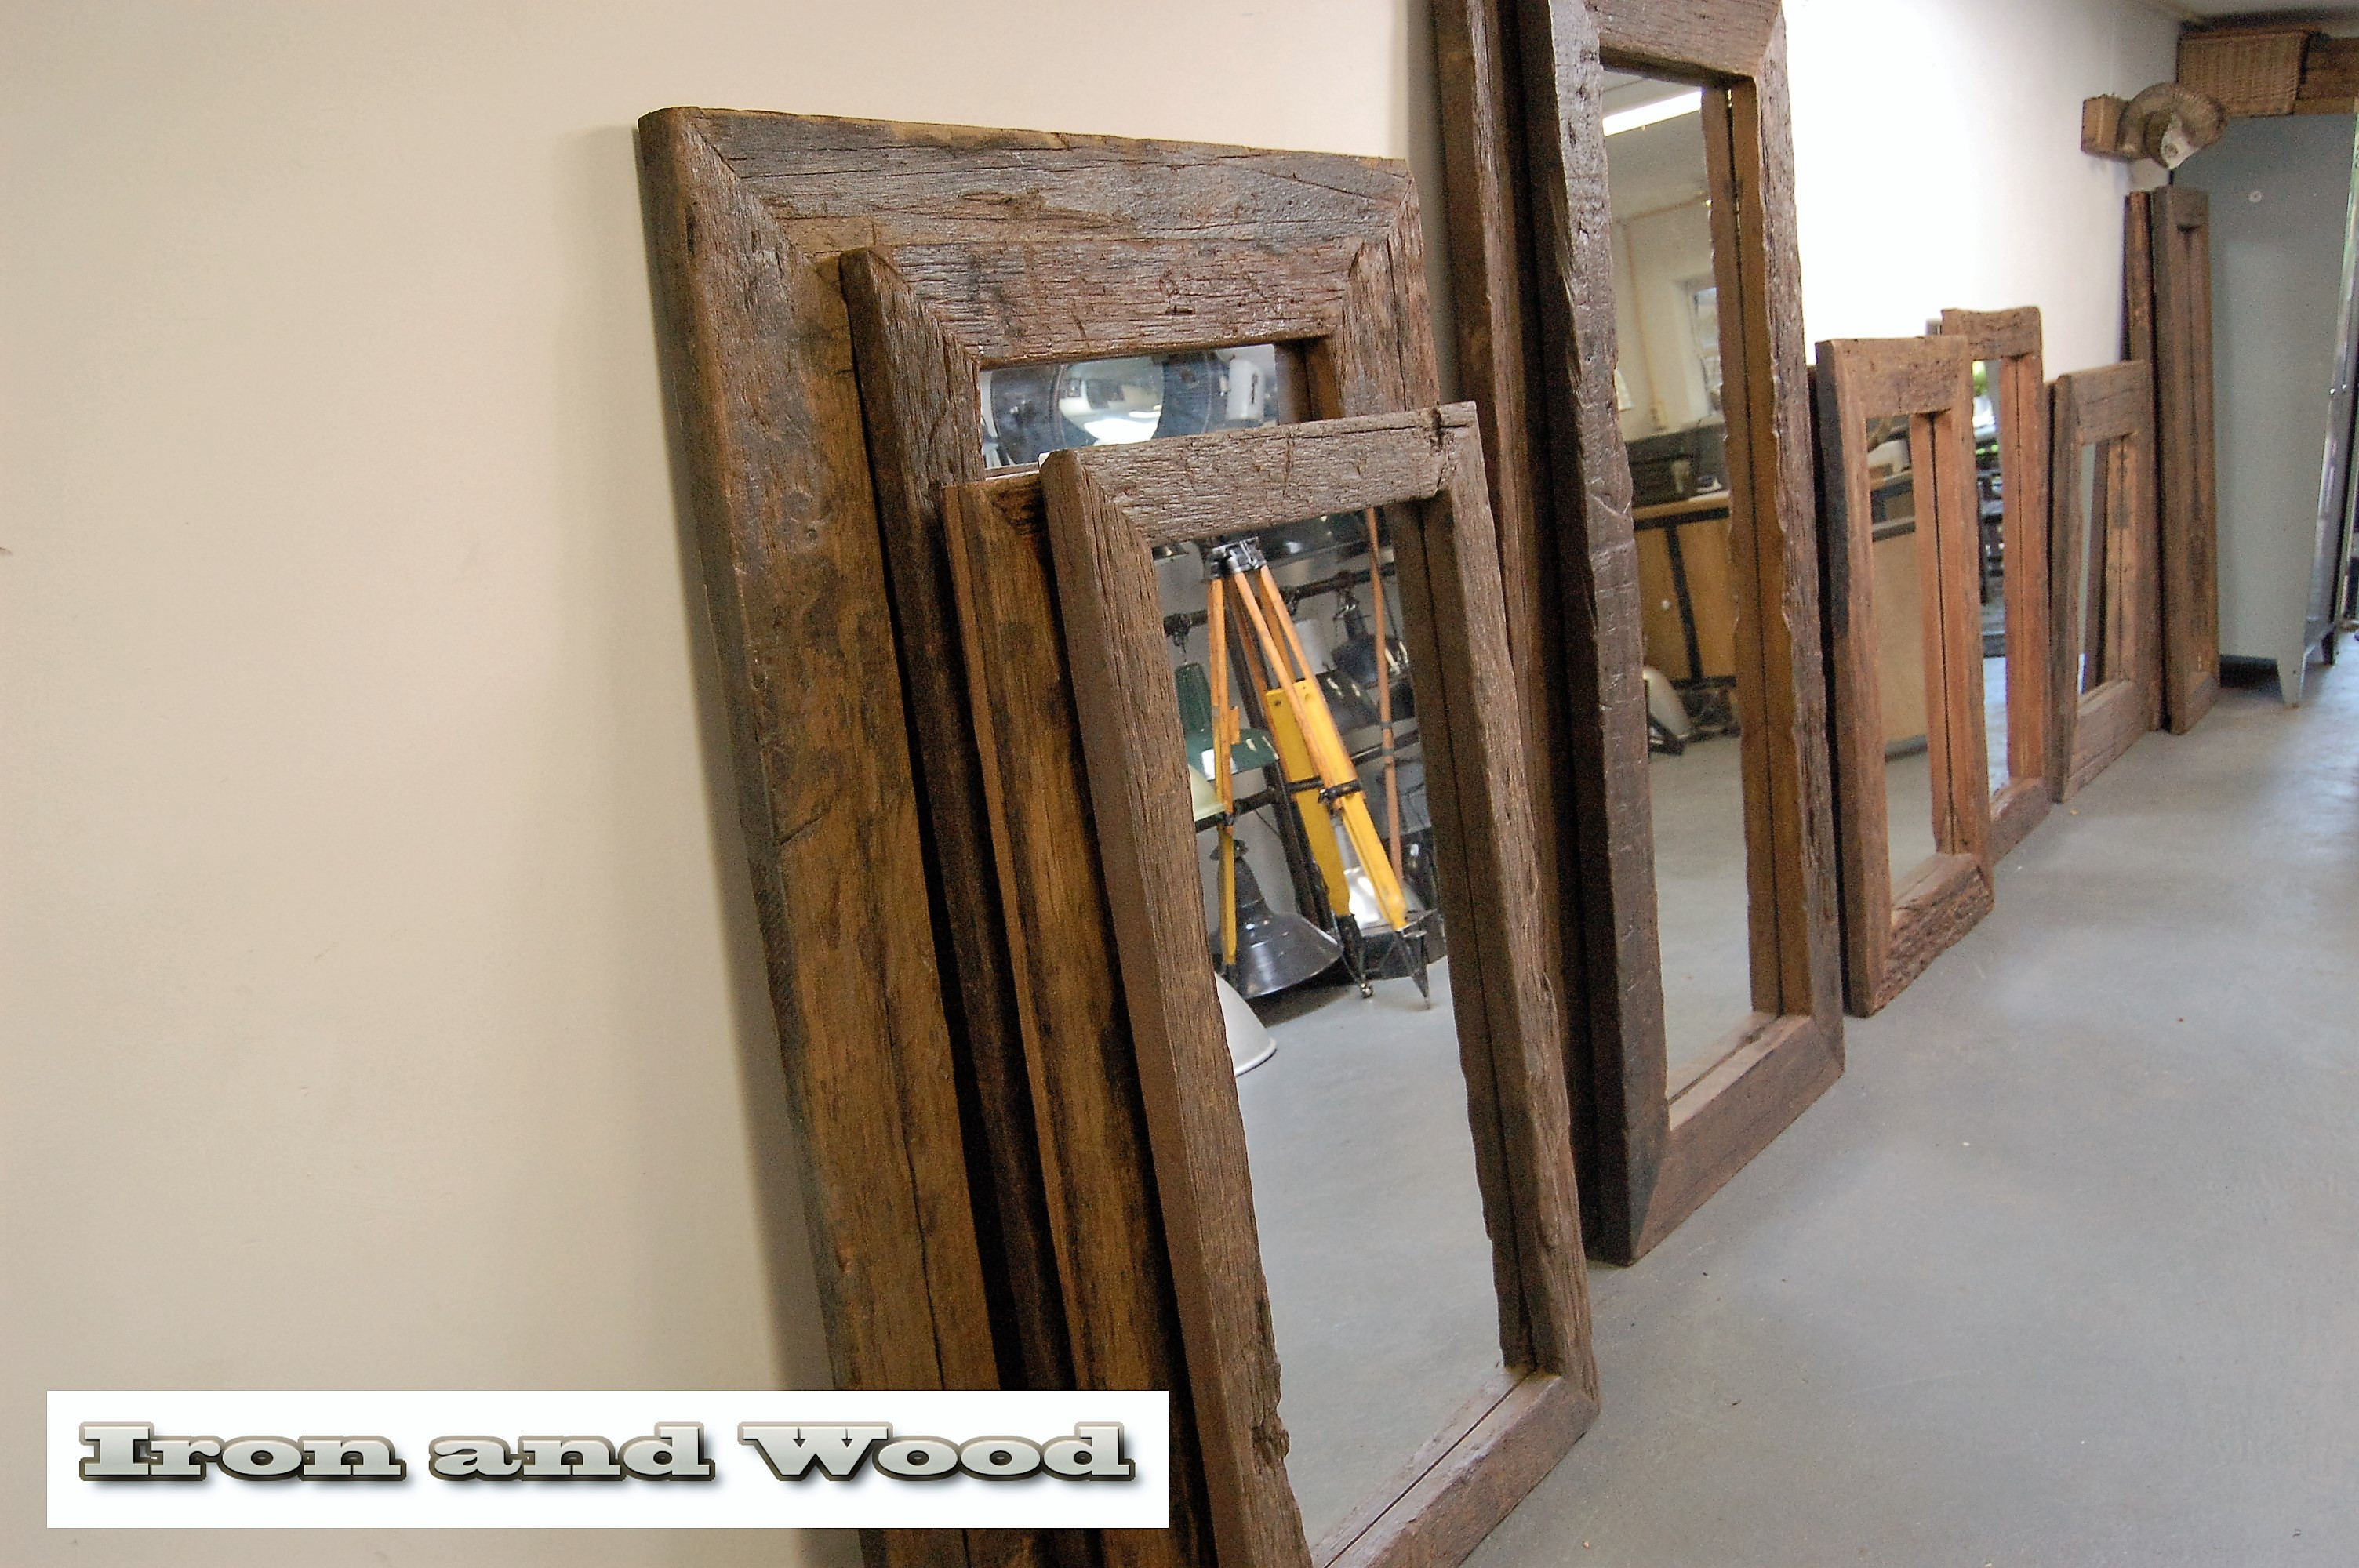 Grote Spiegels Goedkoop : Stoere grote spiegel